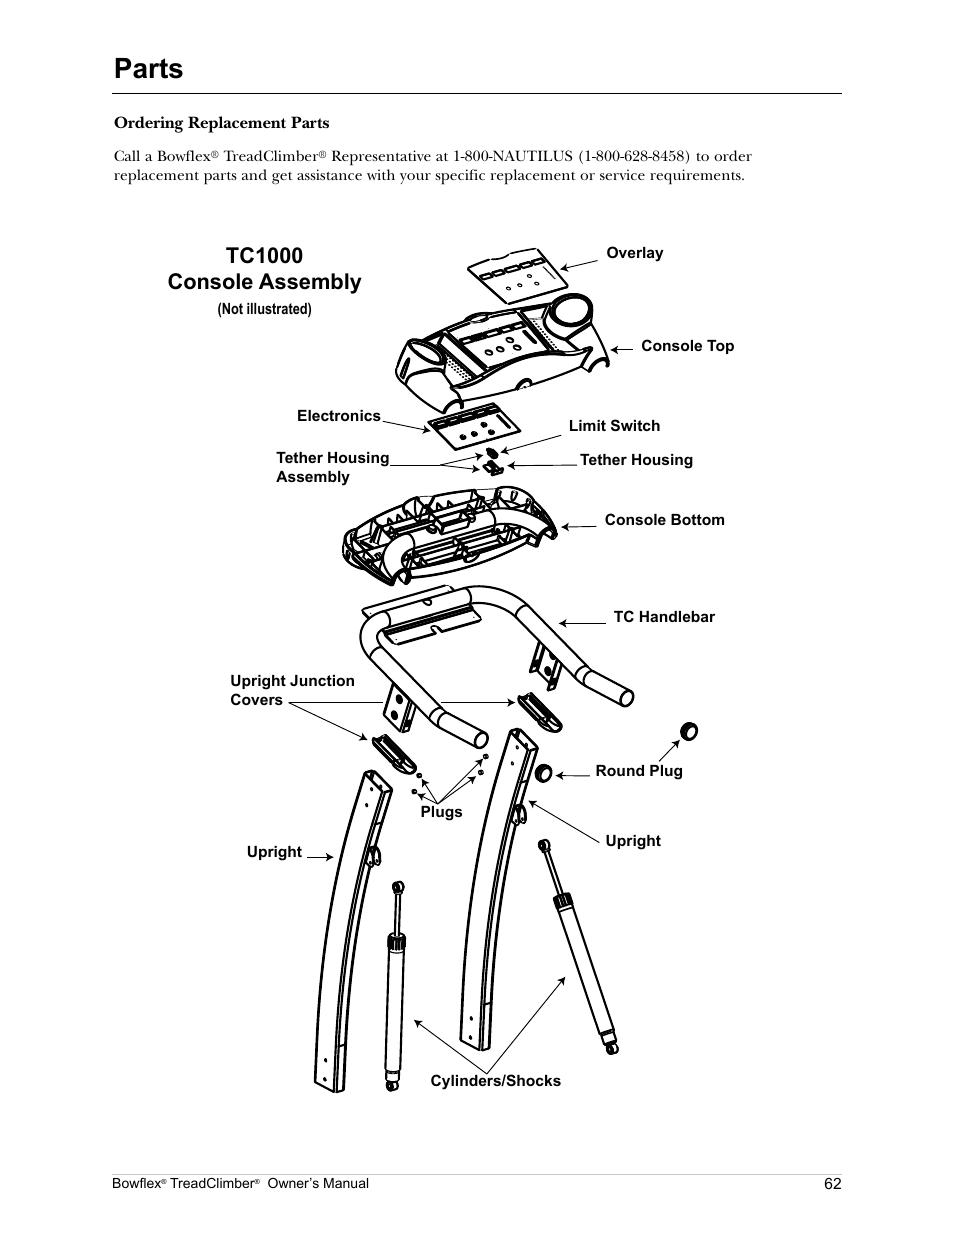 Parts Tc1000 Console Embly Bowflex Treadclimber Tc5000 User Manual Page 65 69